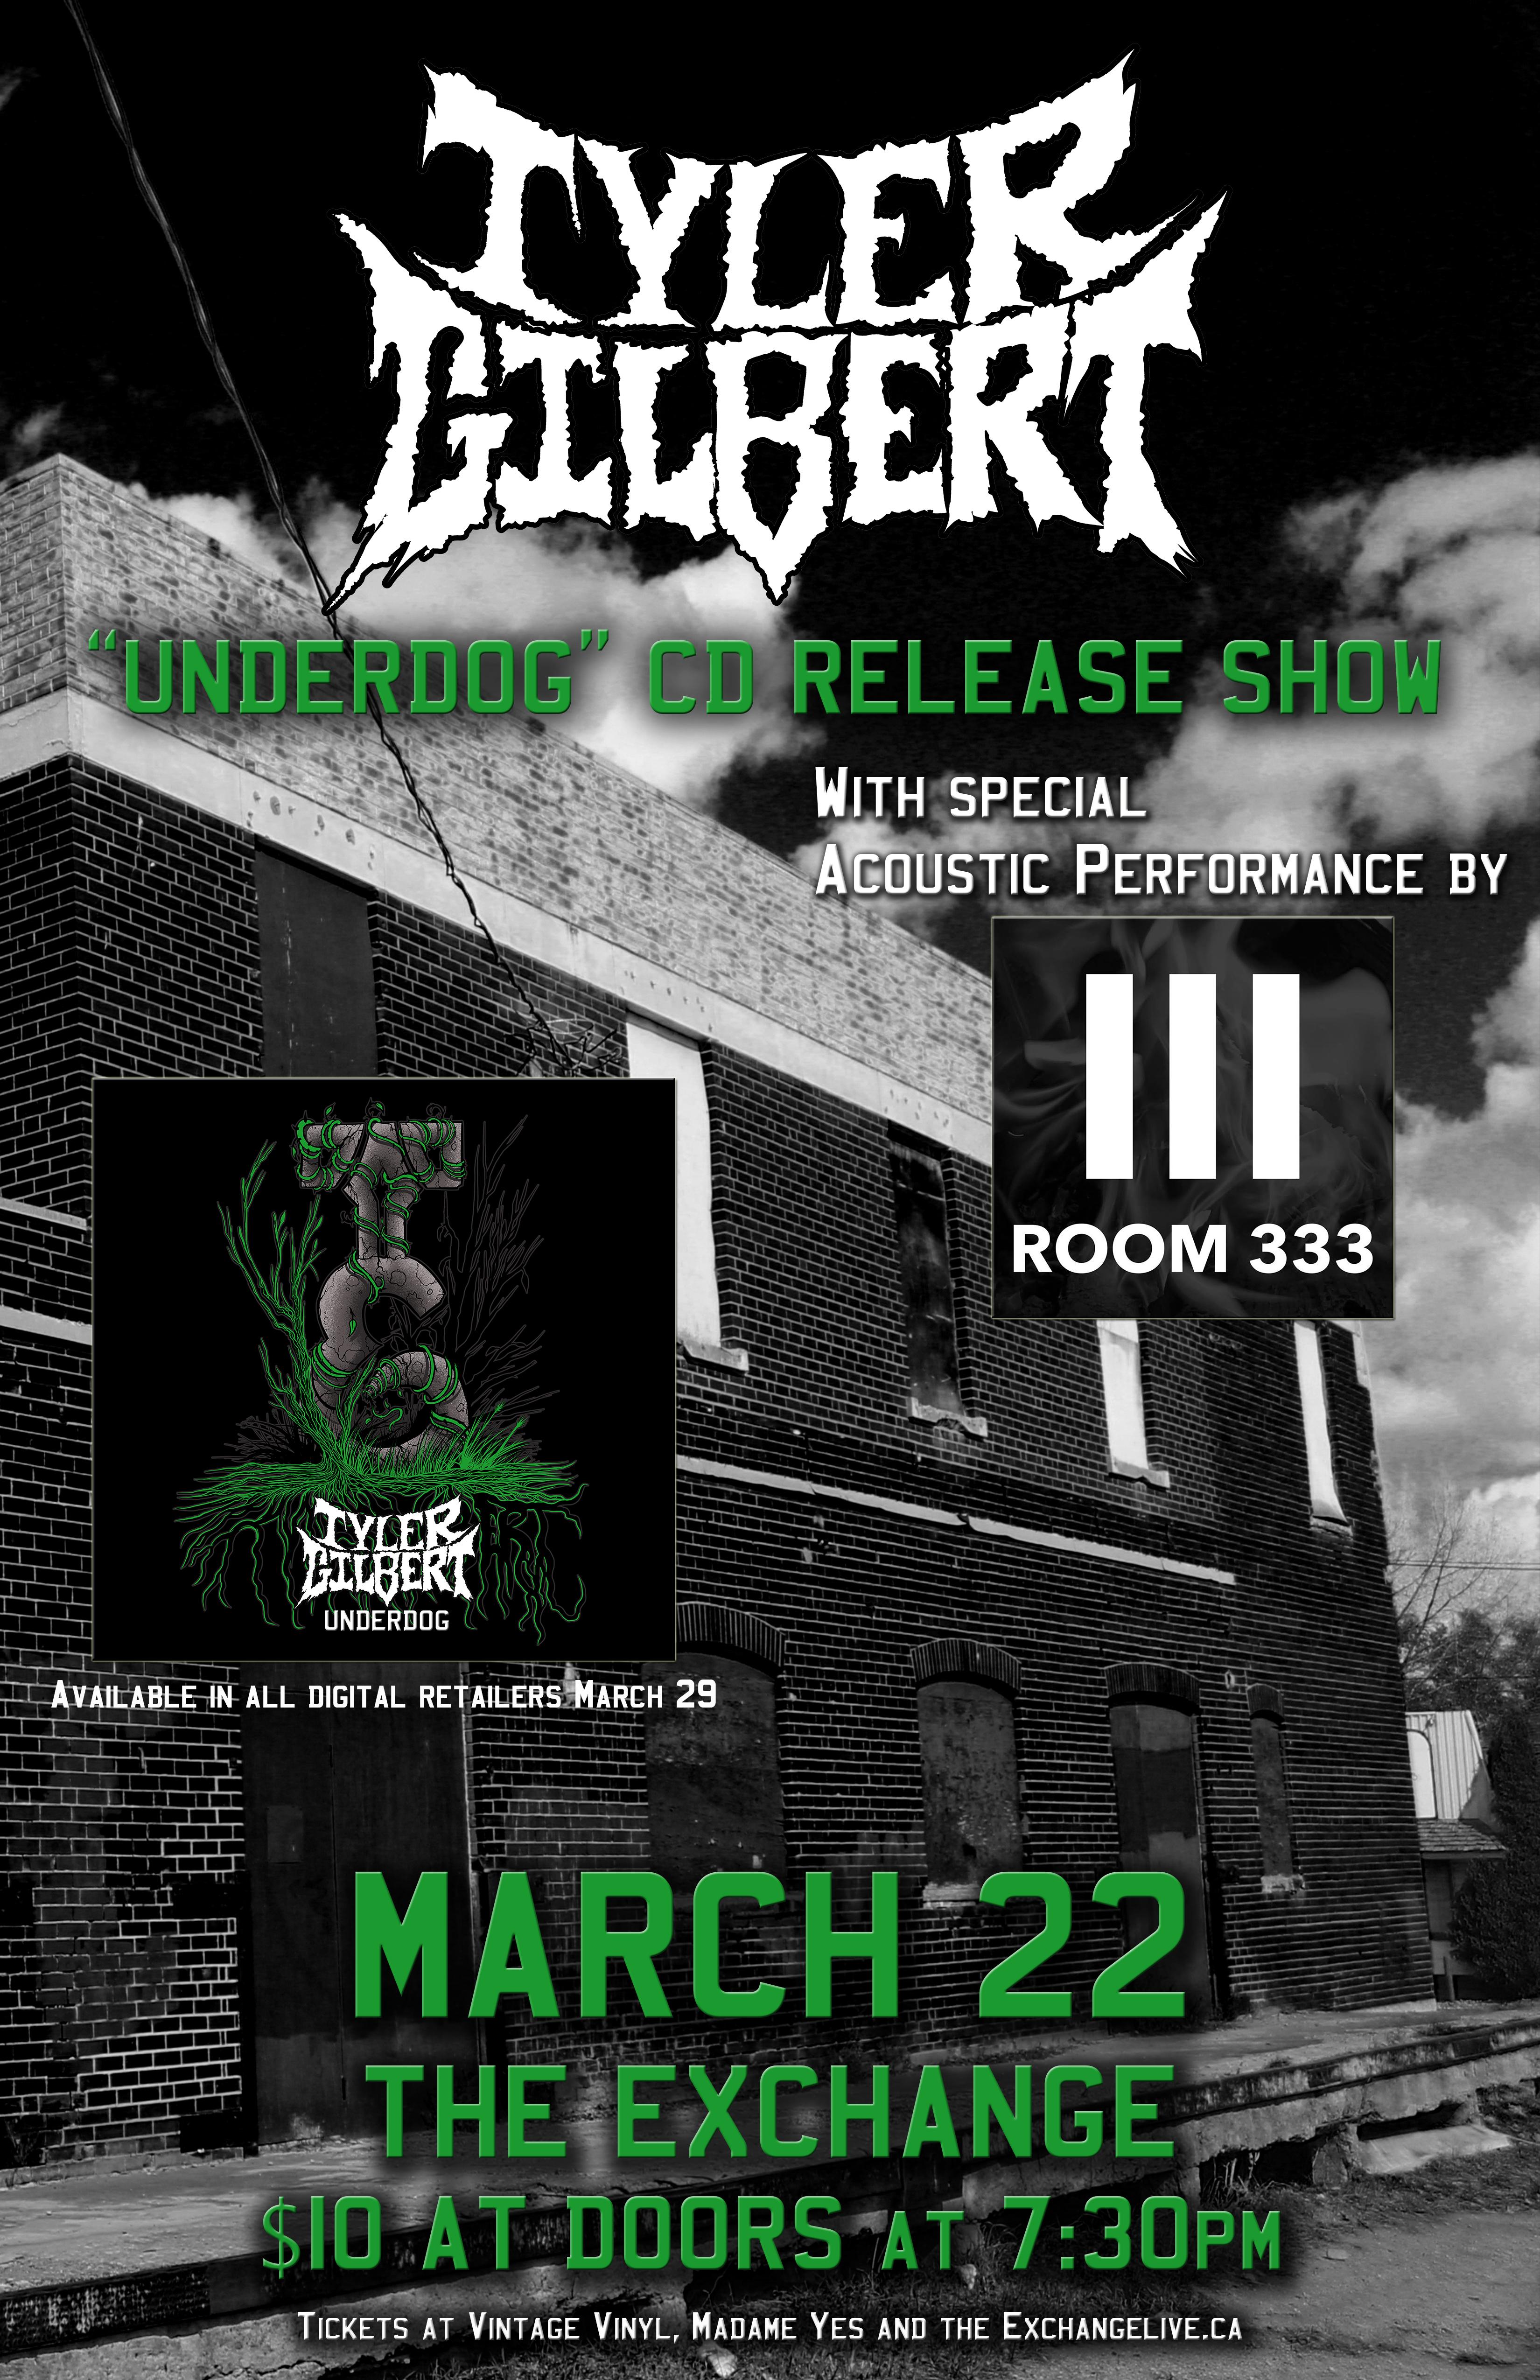 Tyler Gilbert Underdog CD Release Show - March 22